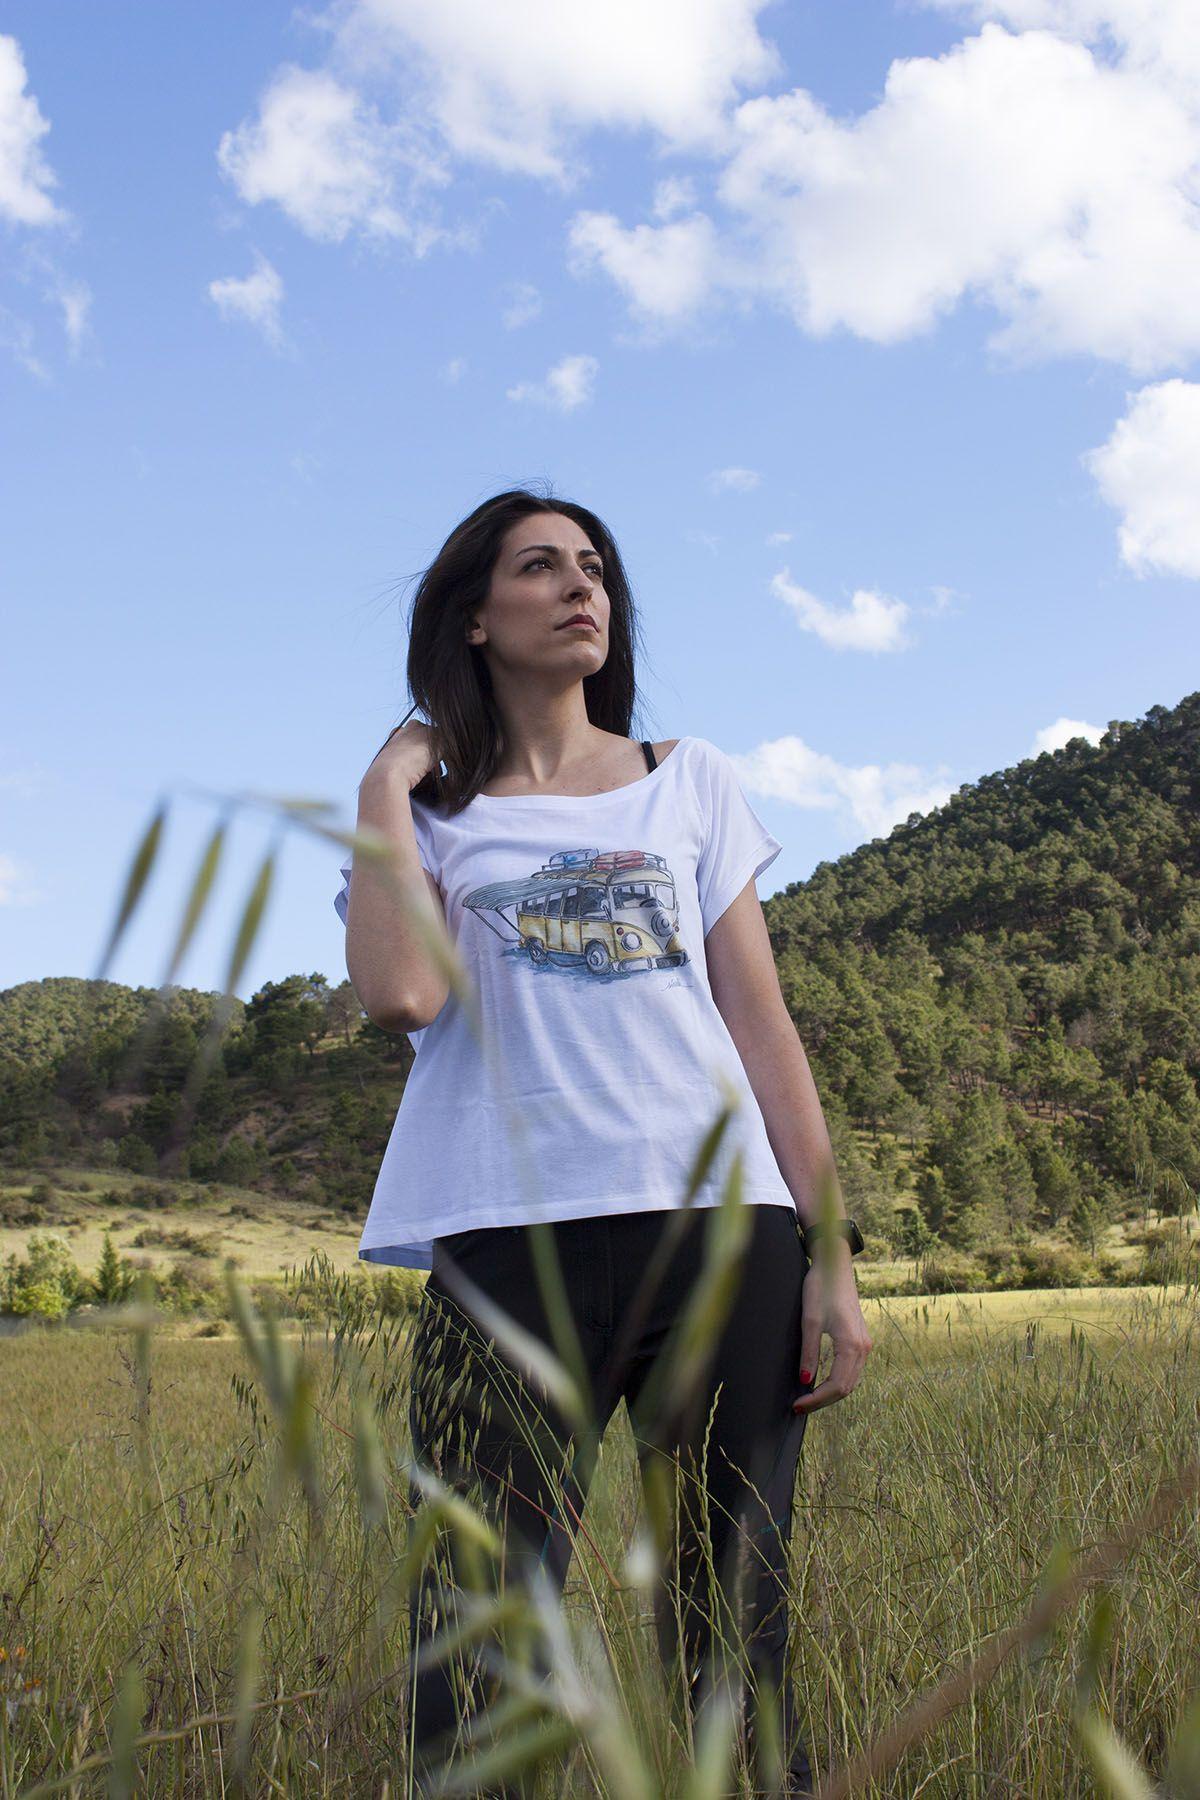 camiseta-furgoneta camper vw-algodon organico-sirem wild-moda etica